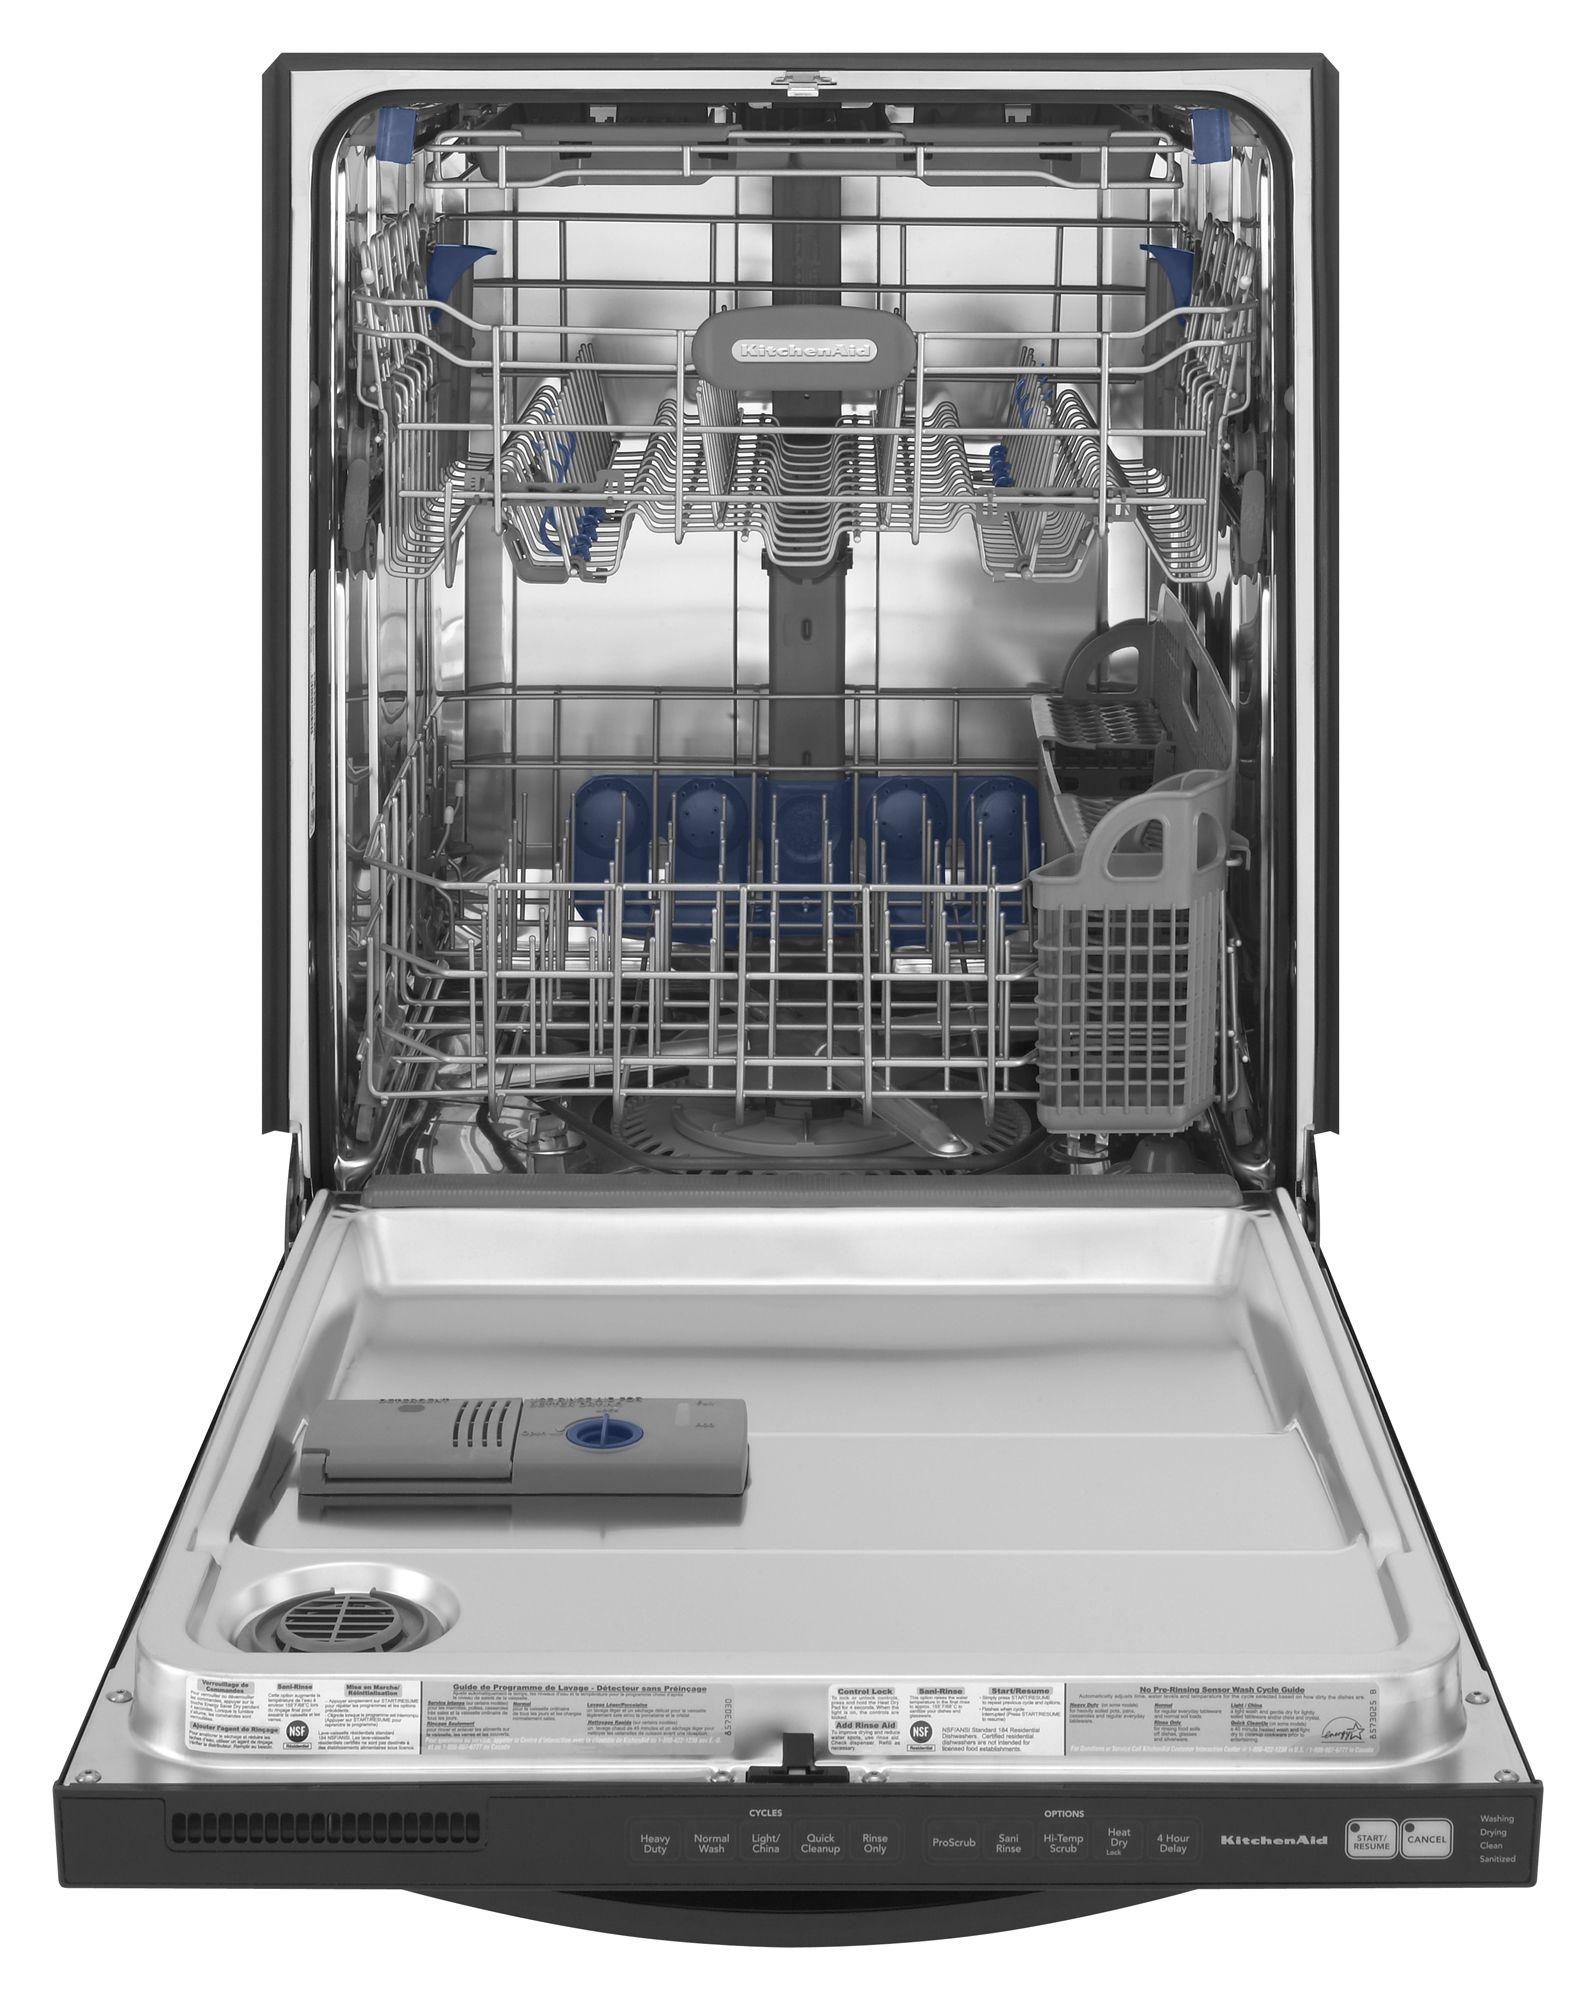 KitchenAid Superba® Series 24 in. Built-In Dishwasher with ProScrub® (KUDS50FV)